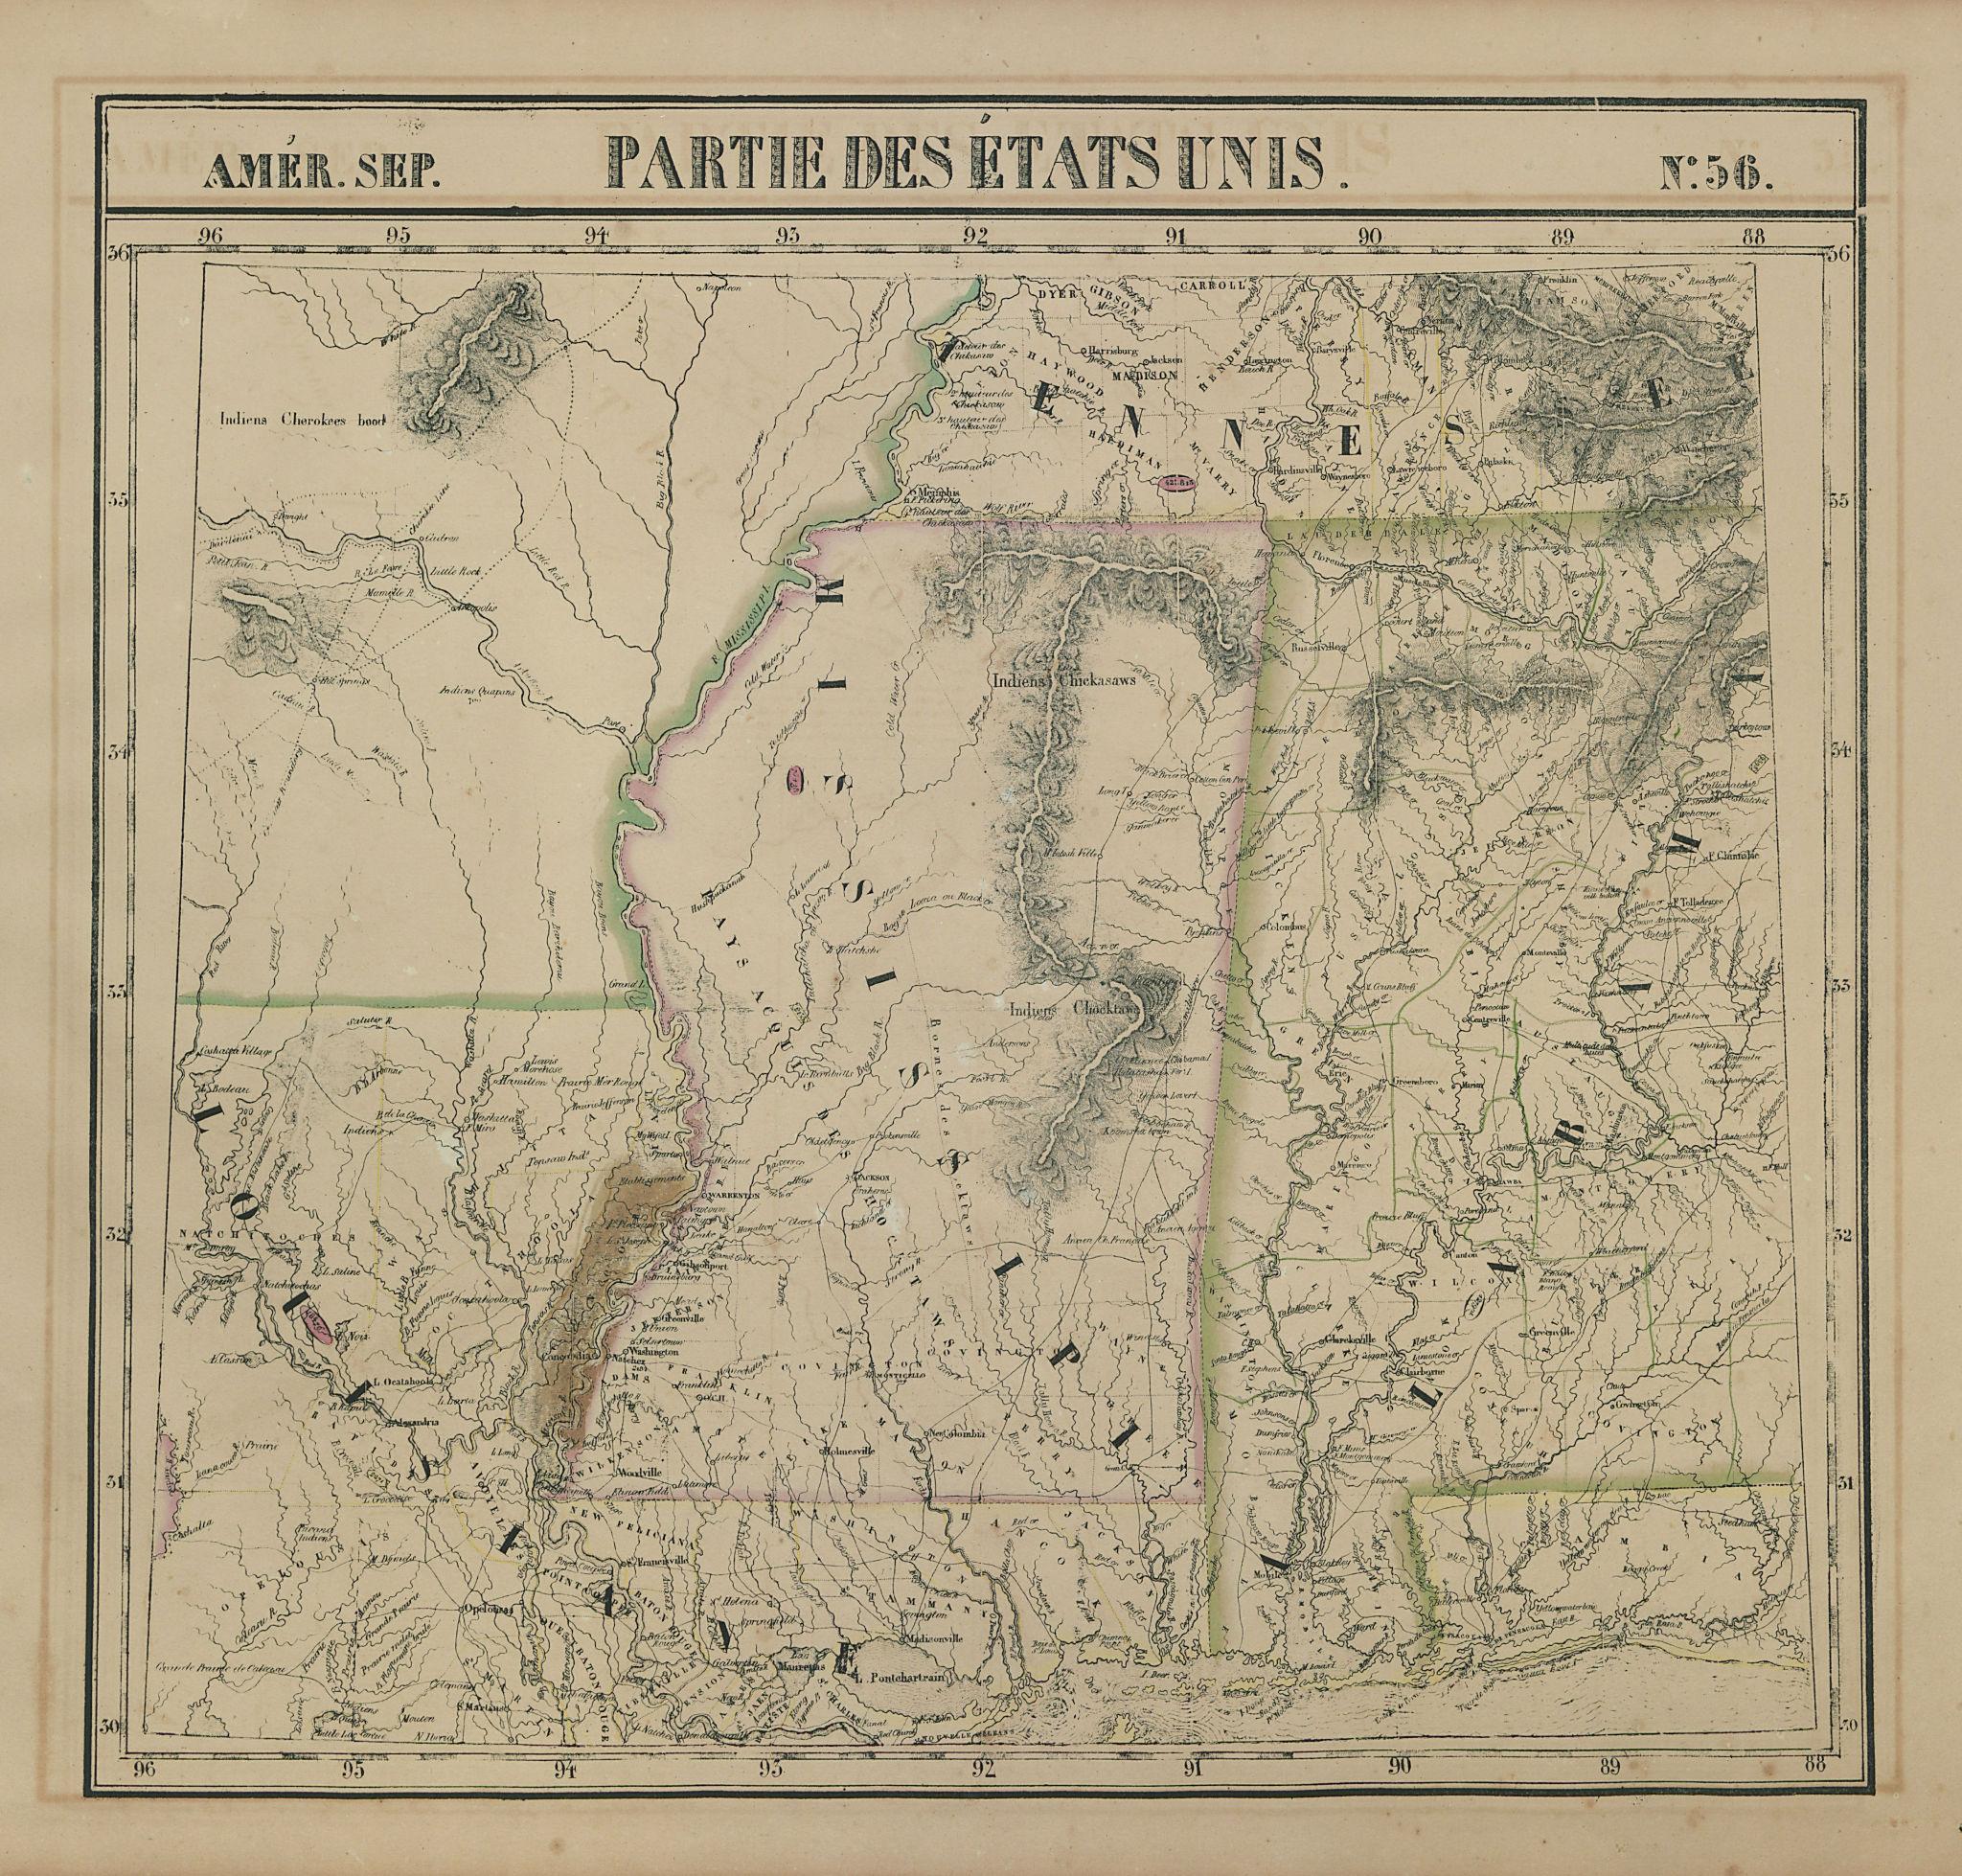 Amér. Sep. Partie des États-Unis #56. Mississippi Alabama. VANDERMAELEN 1827 map